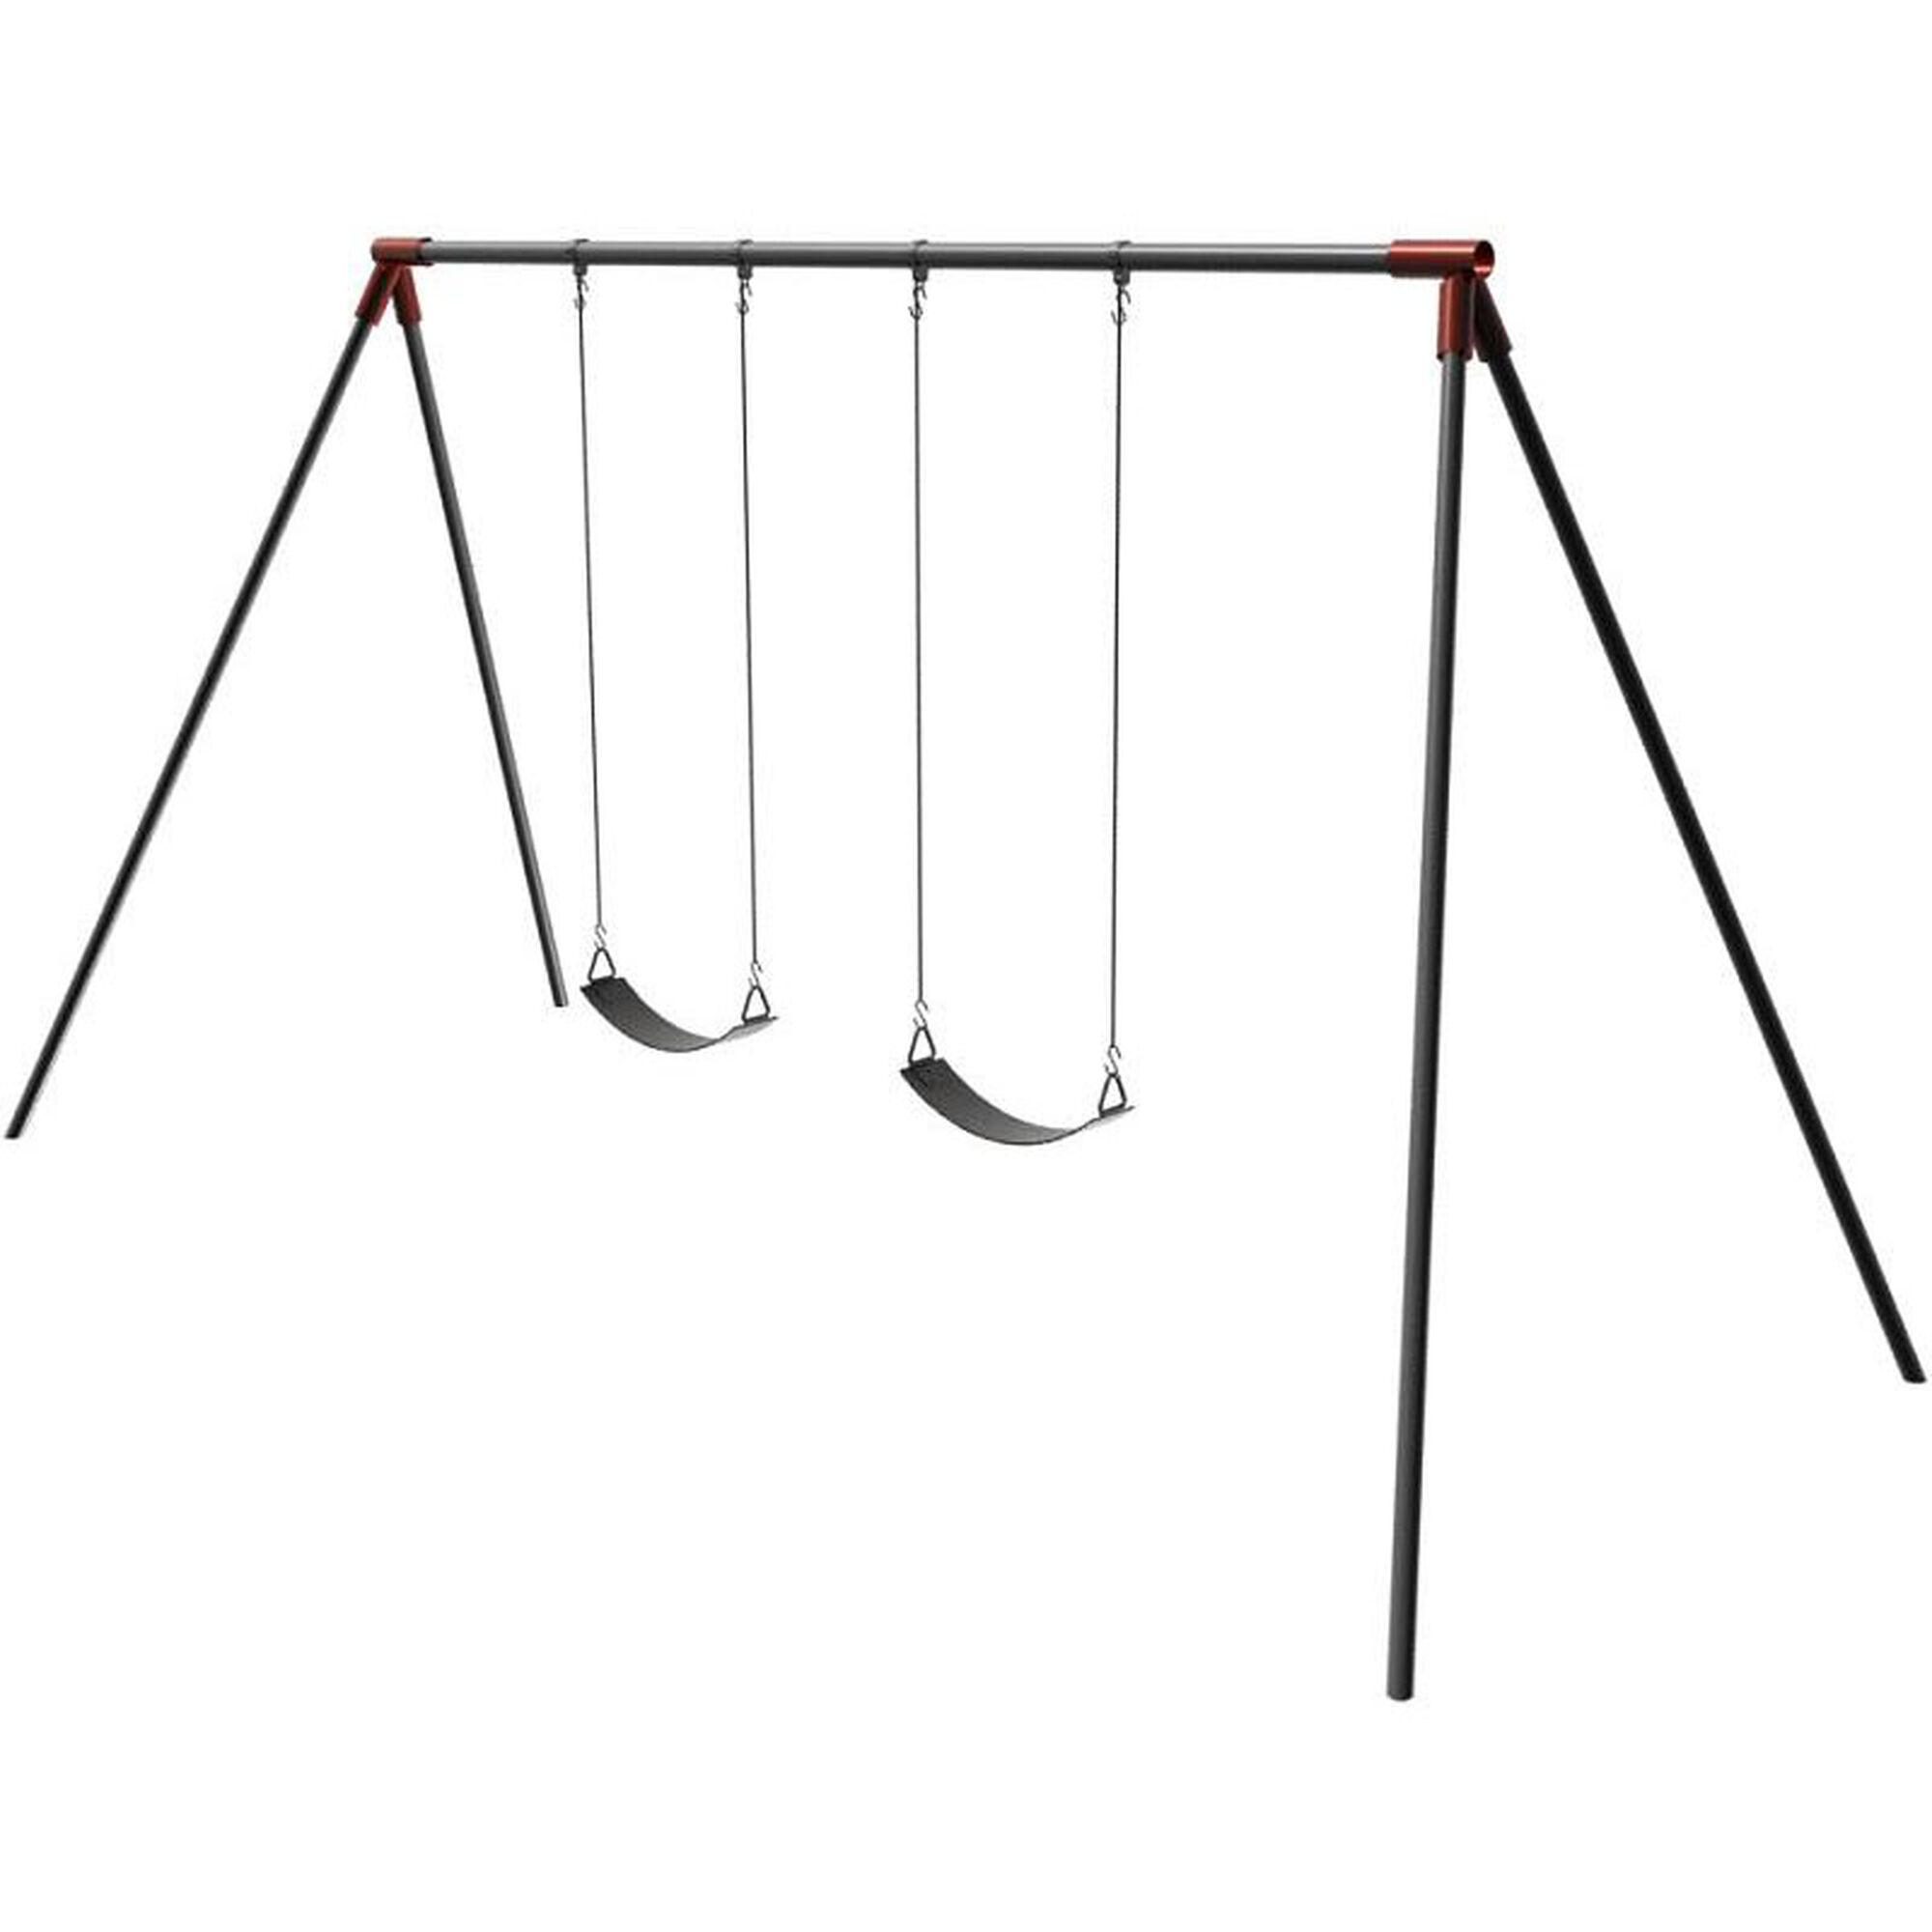 2 Seat Primary Bipod Swing Set 581 218 Bizchair Com